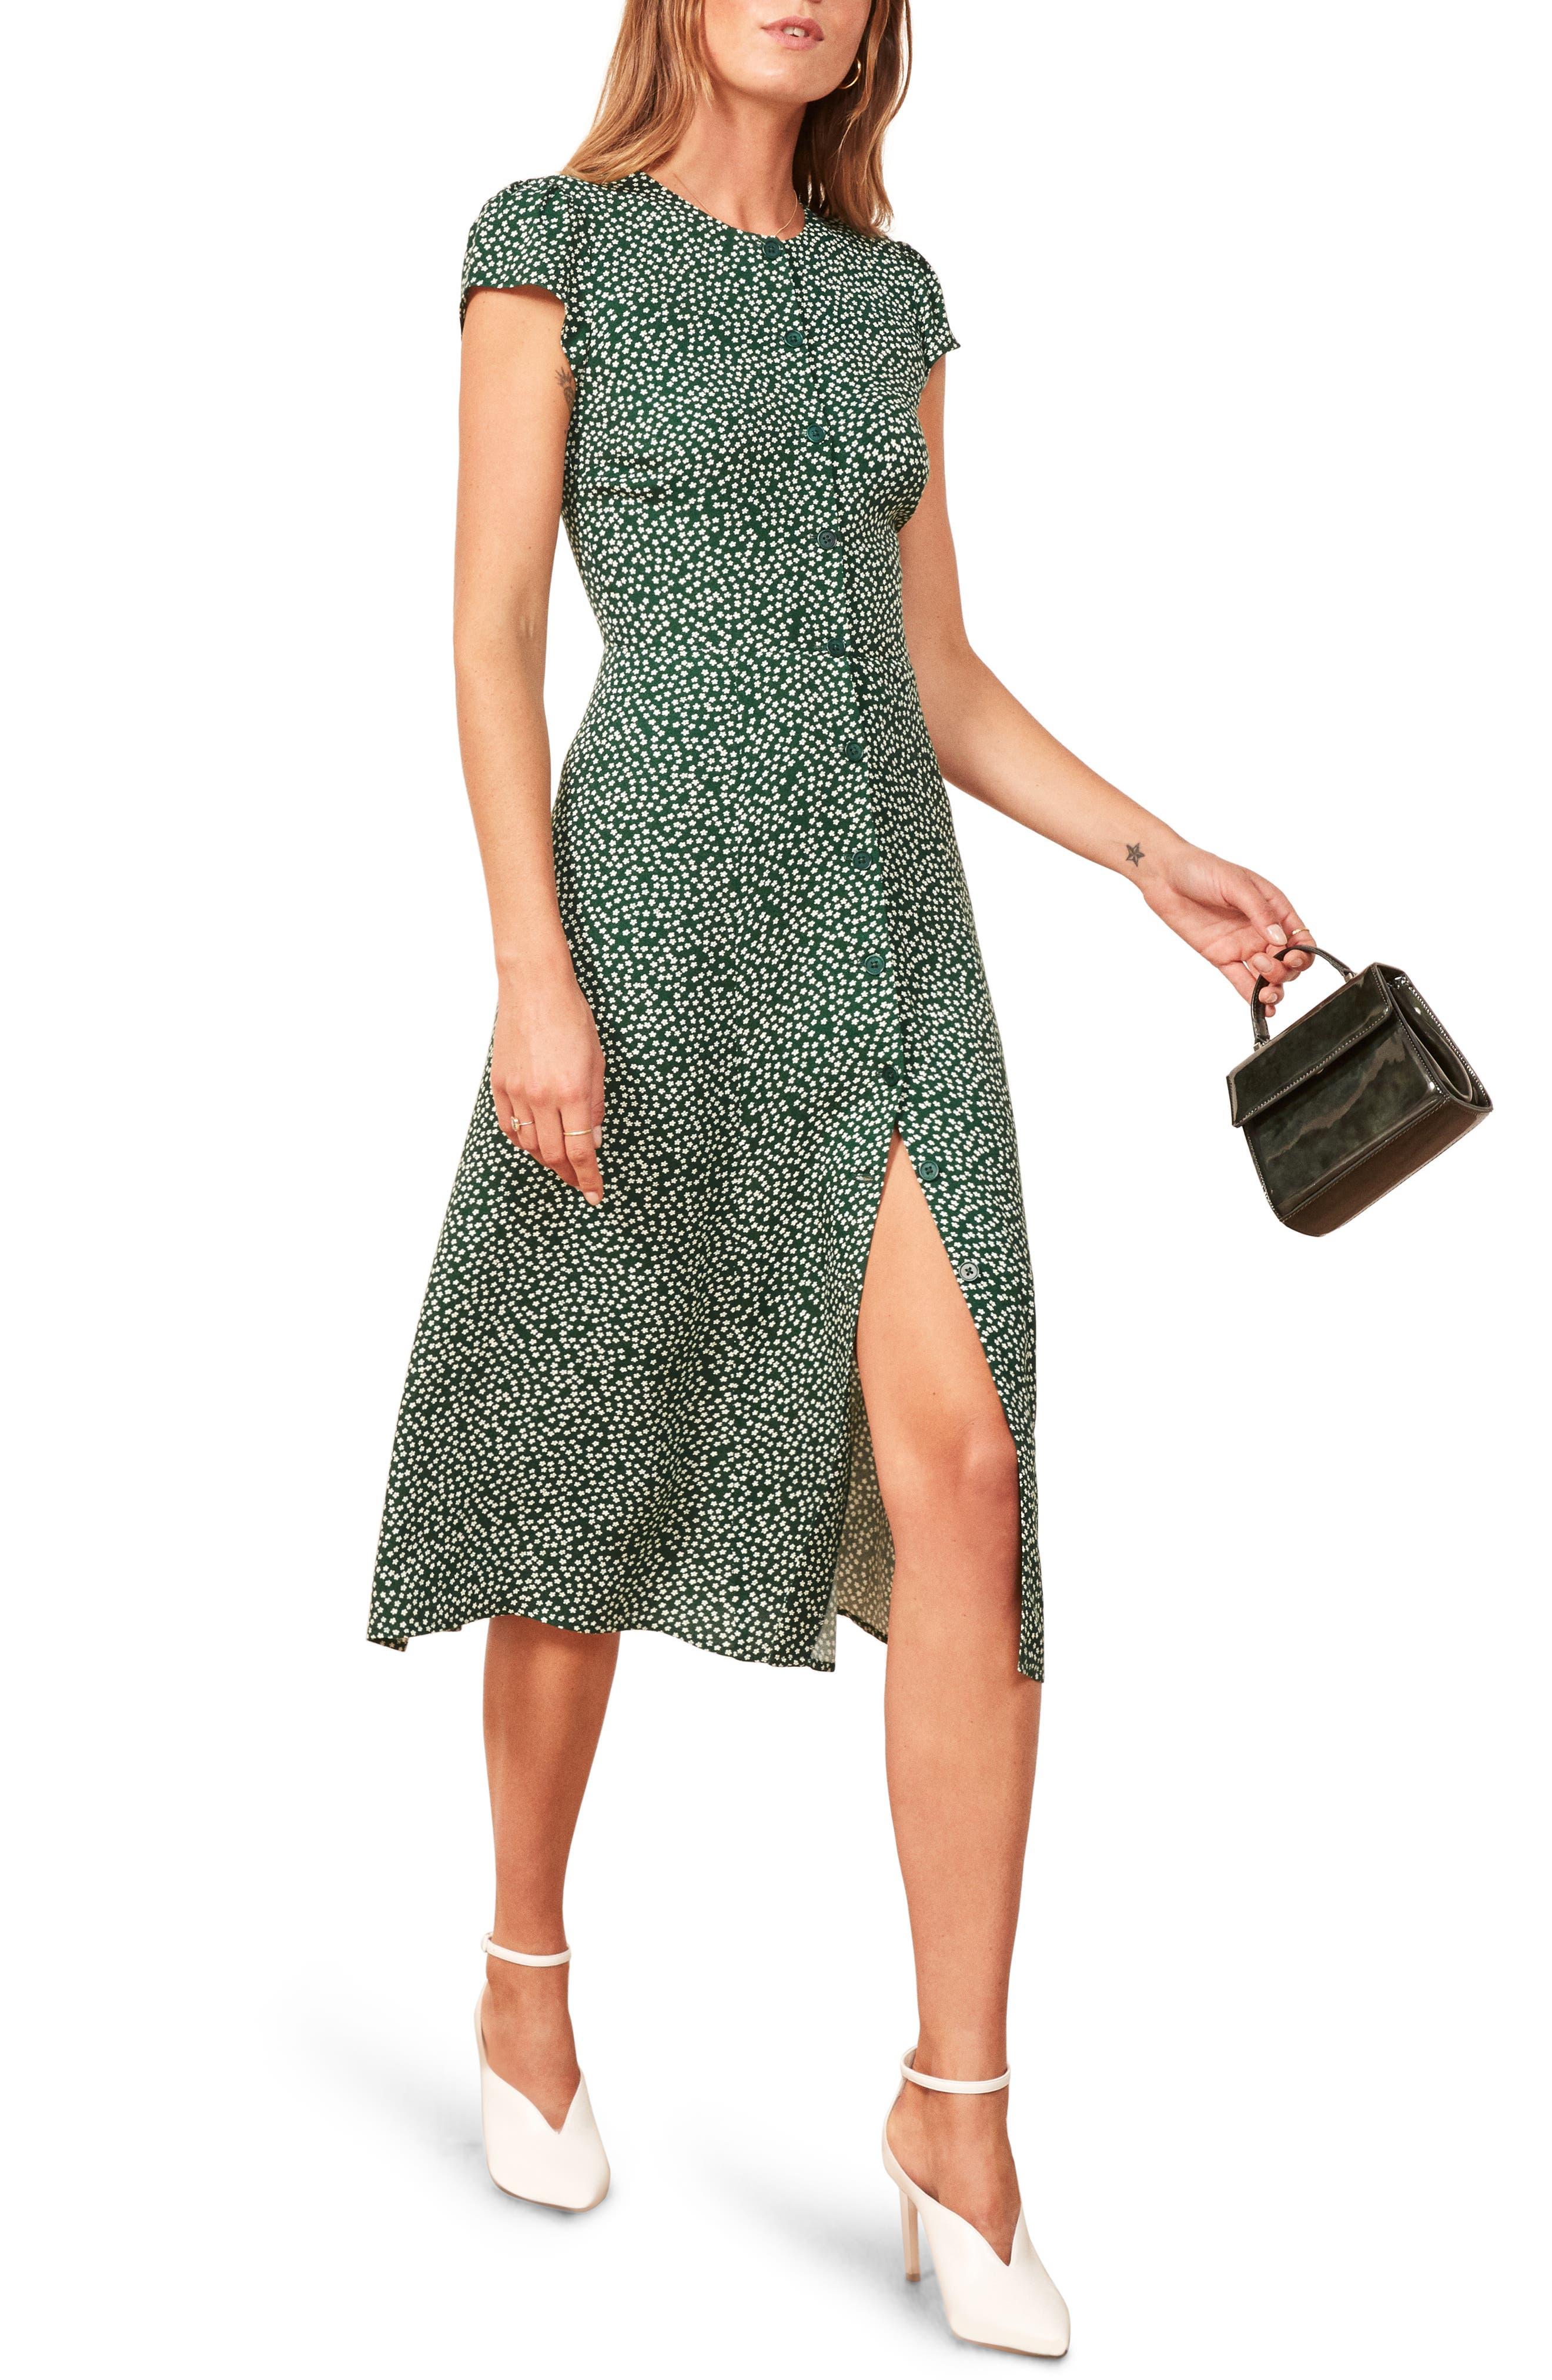 Reformation Fauna Front Button Midi Dress, Green